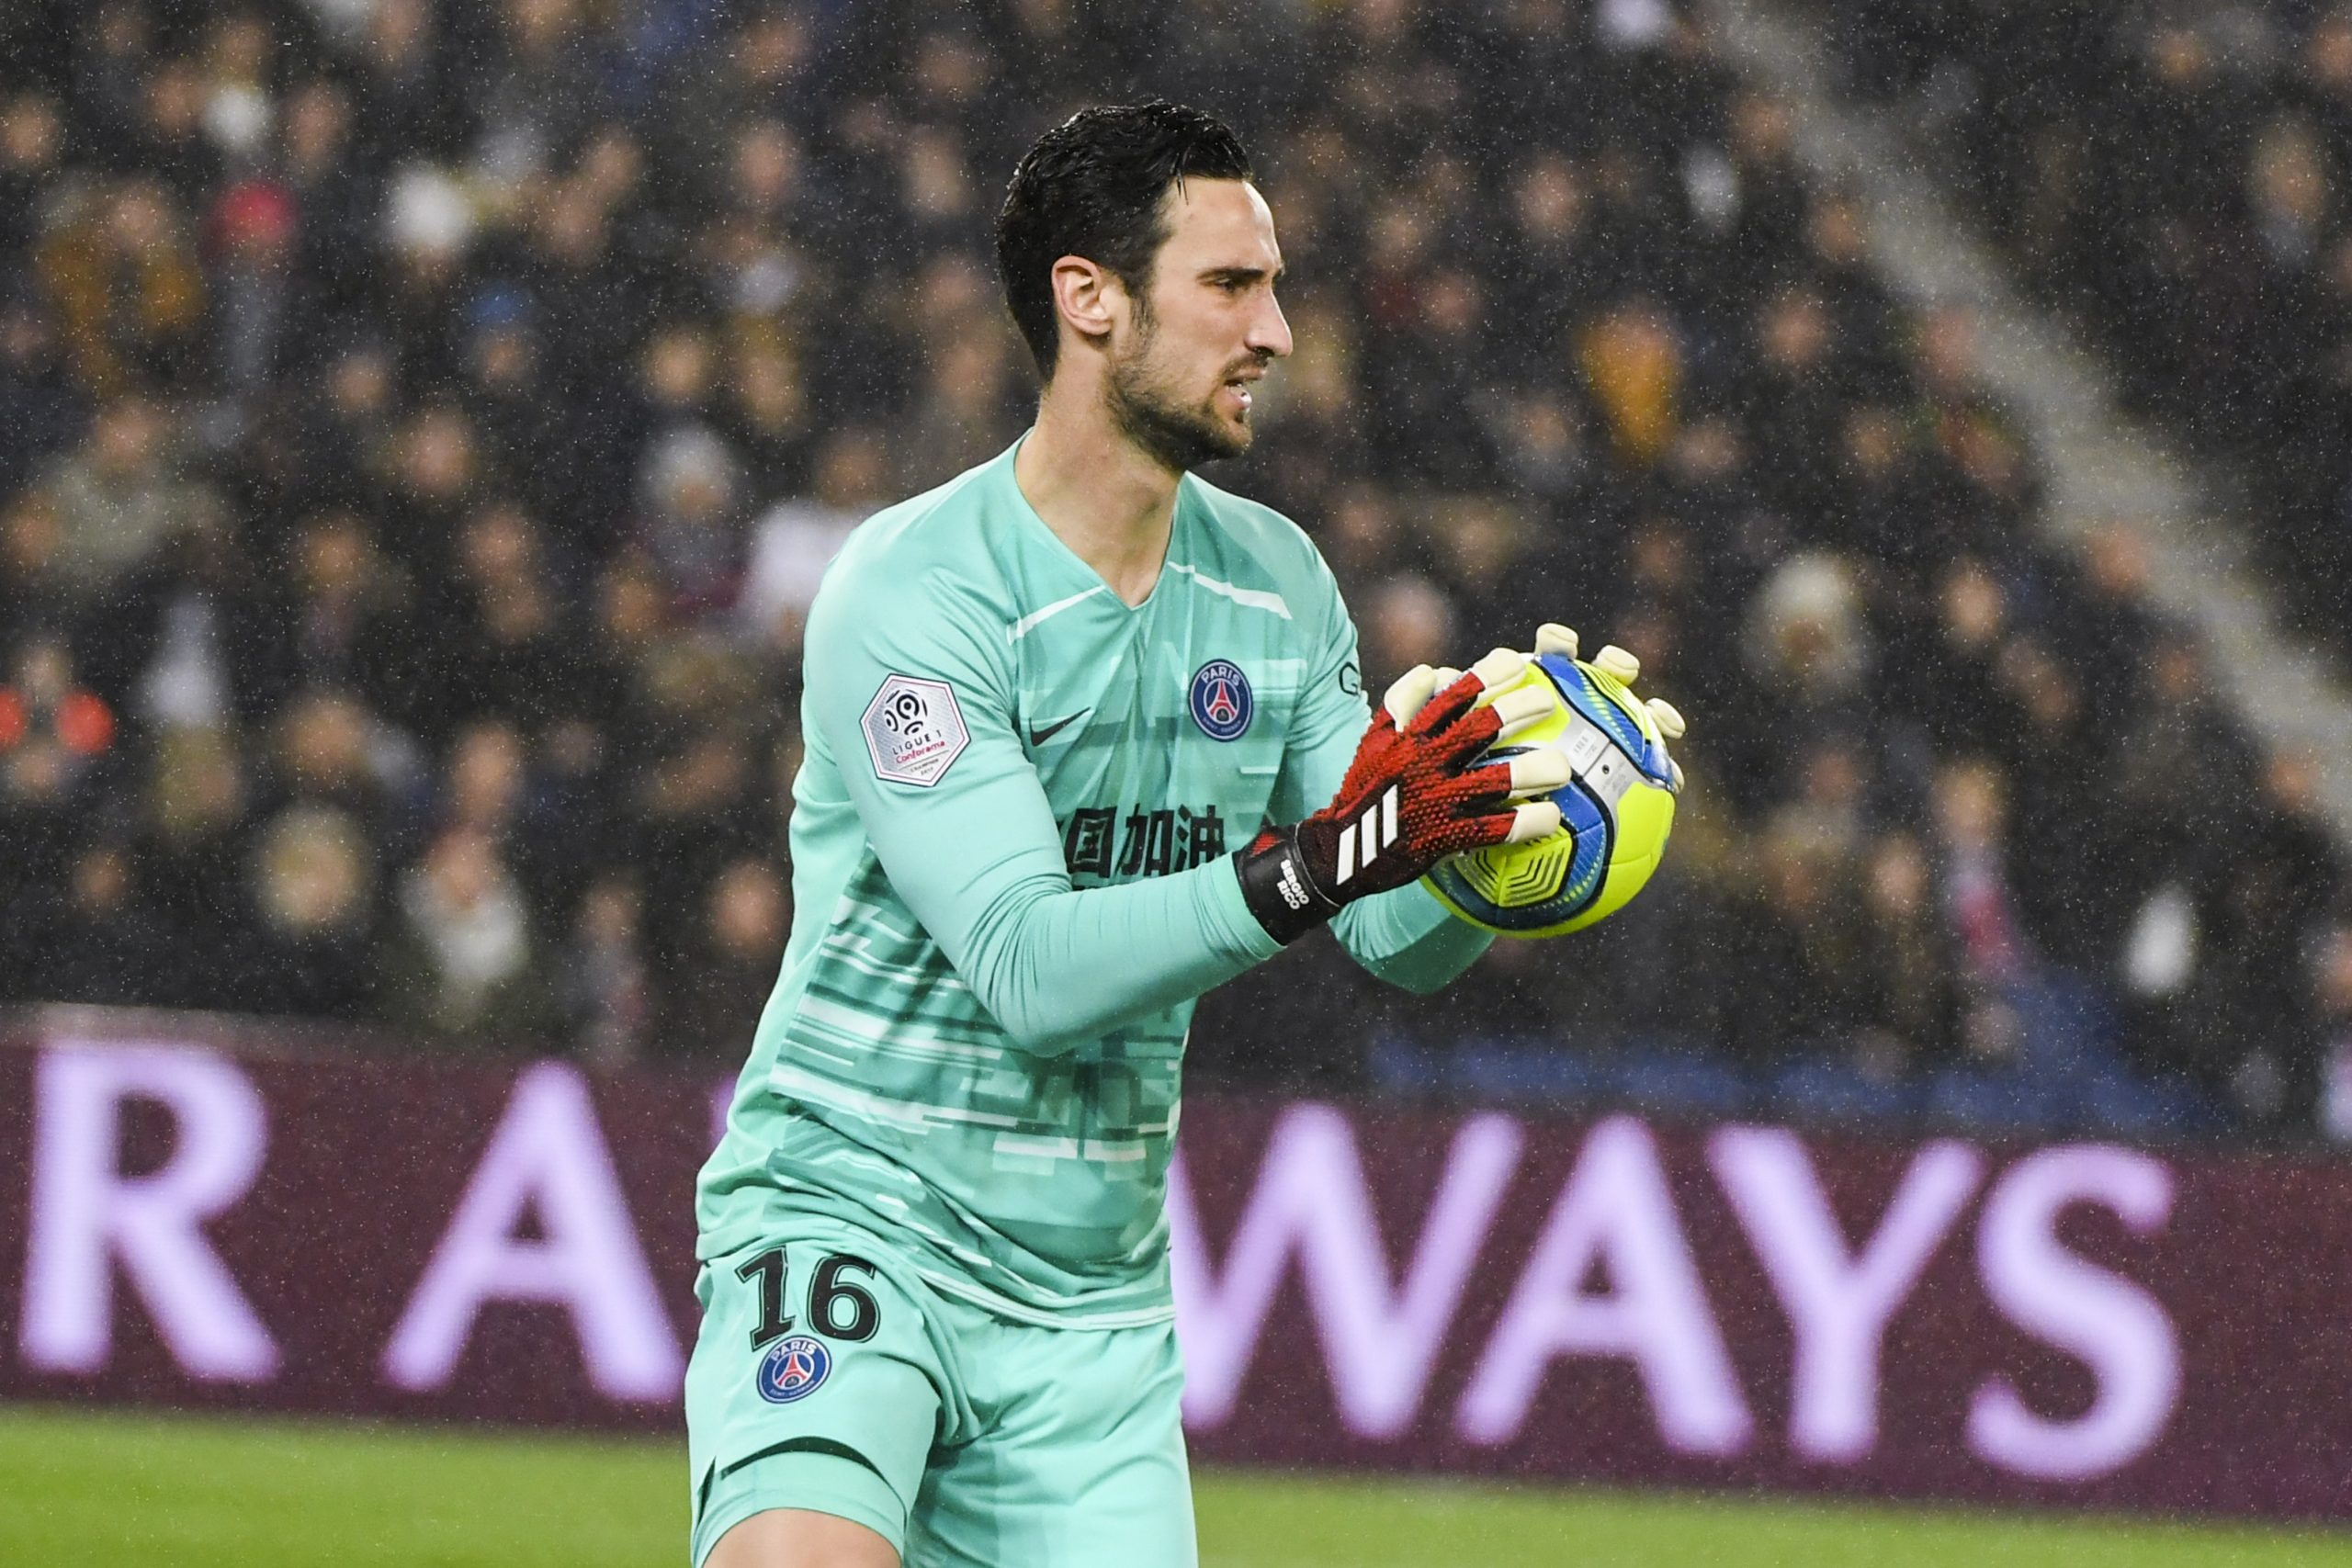 Mercato - Sergio Rico ne restera pas au PSG ni à Séville, indique Estadio Deportivo